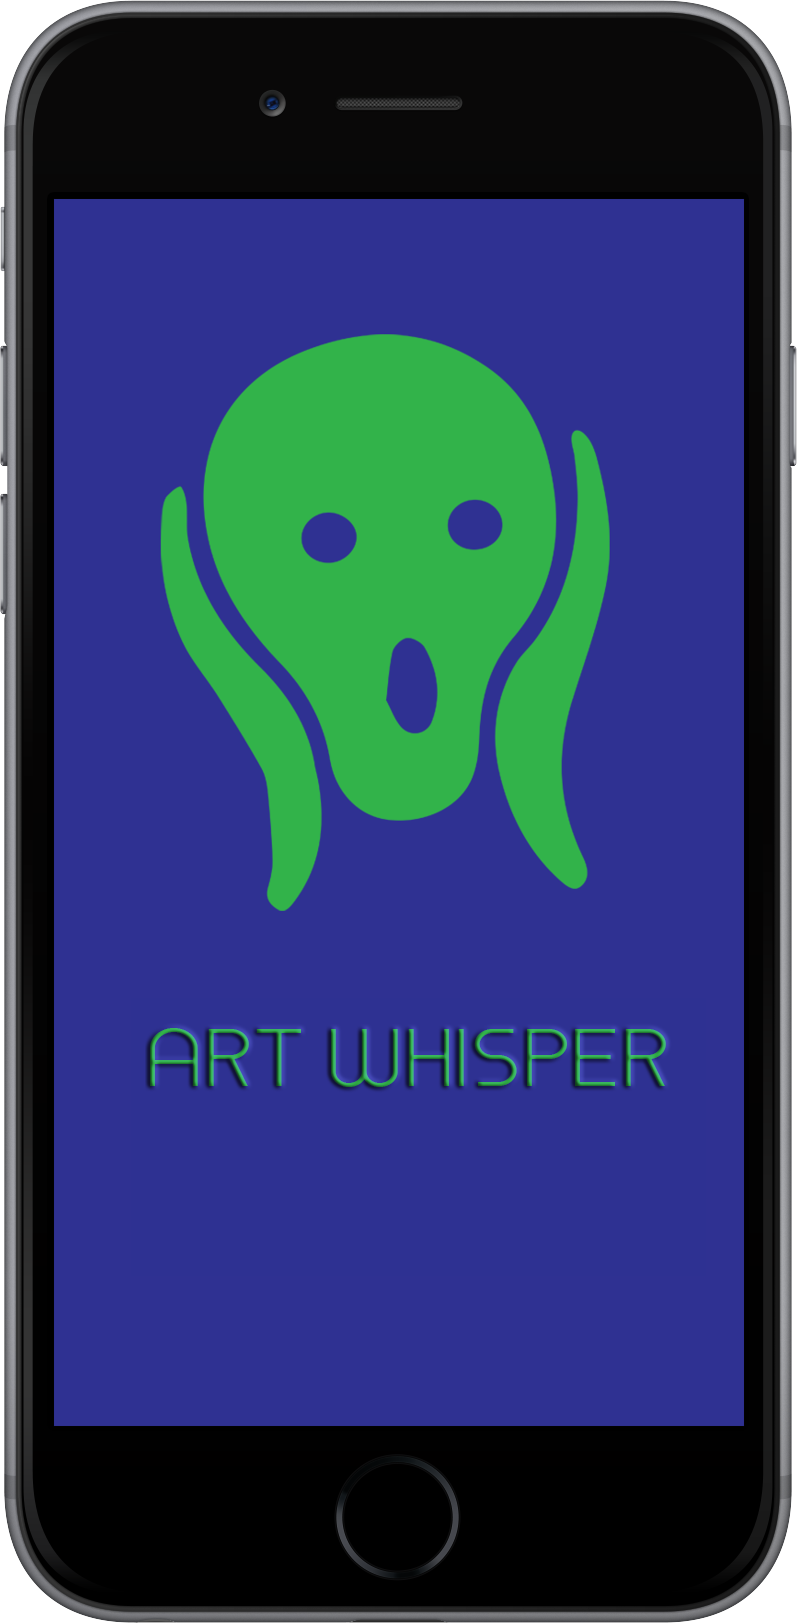 ArtWhisperLogox.png